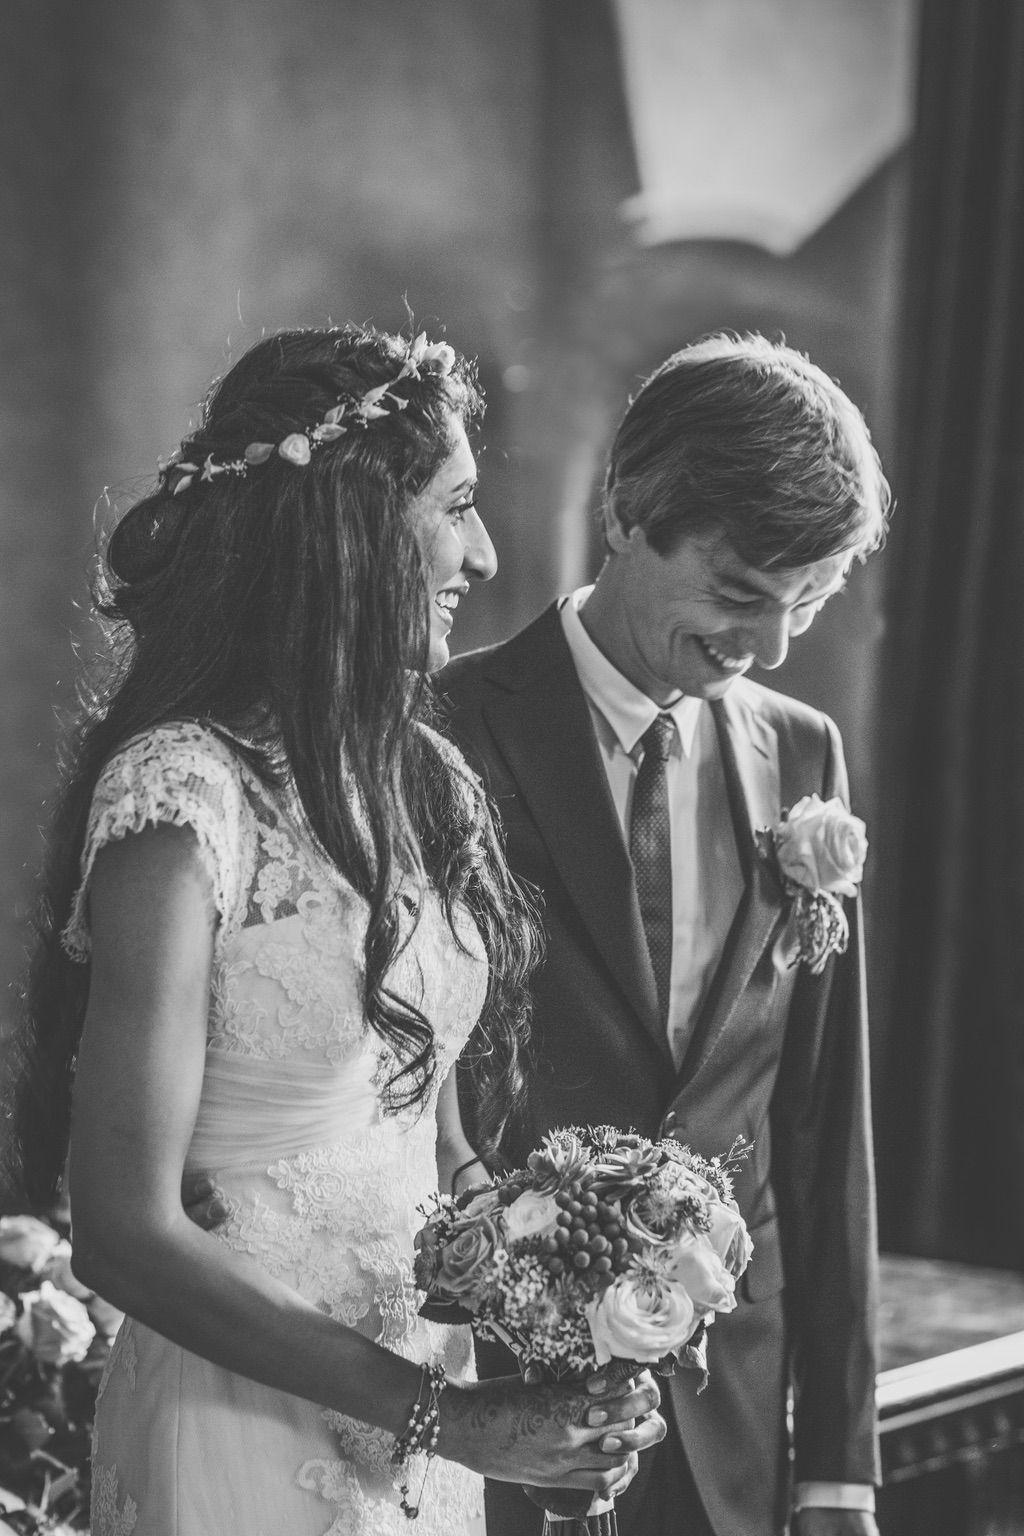 fusion-pakistani-wedding-civil-ceremony-town-hall-Siena-048